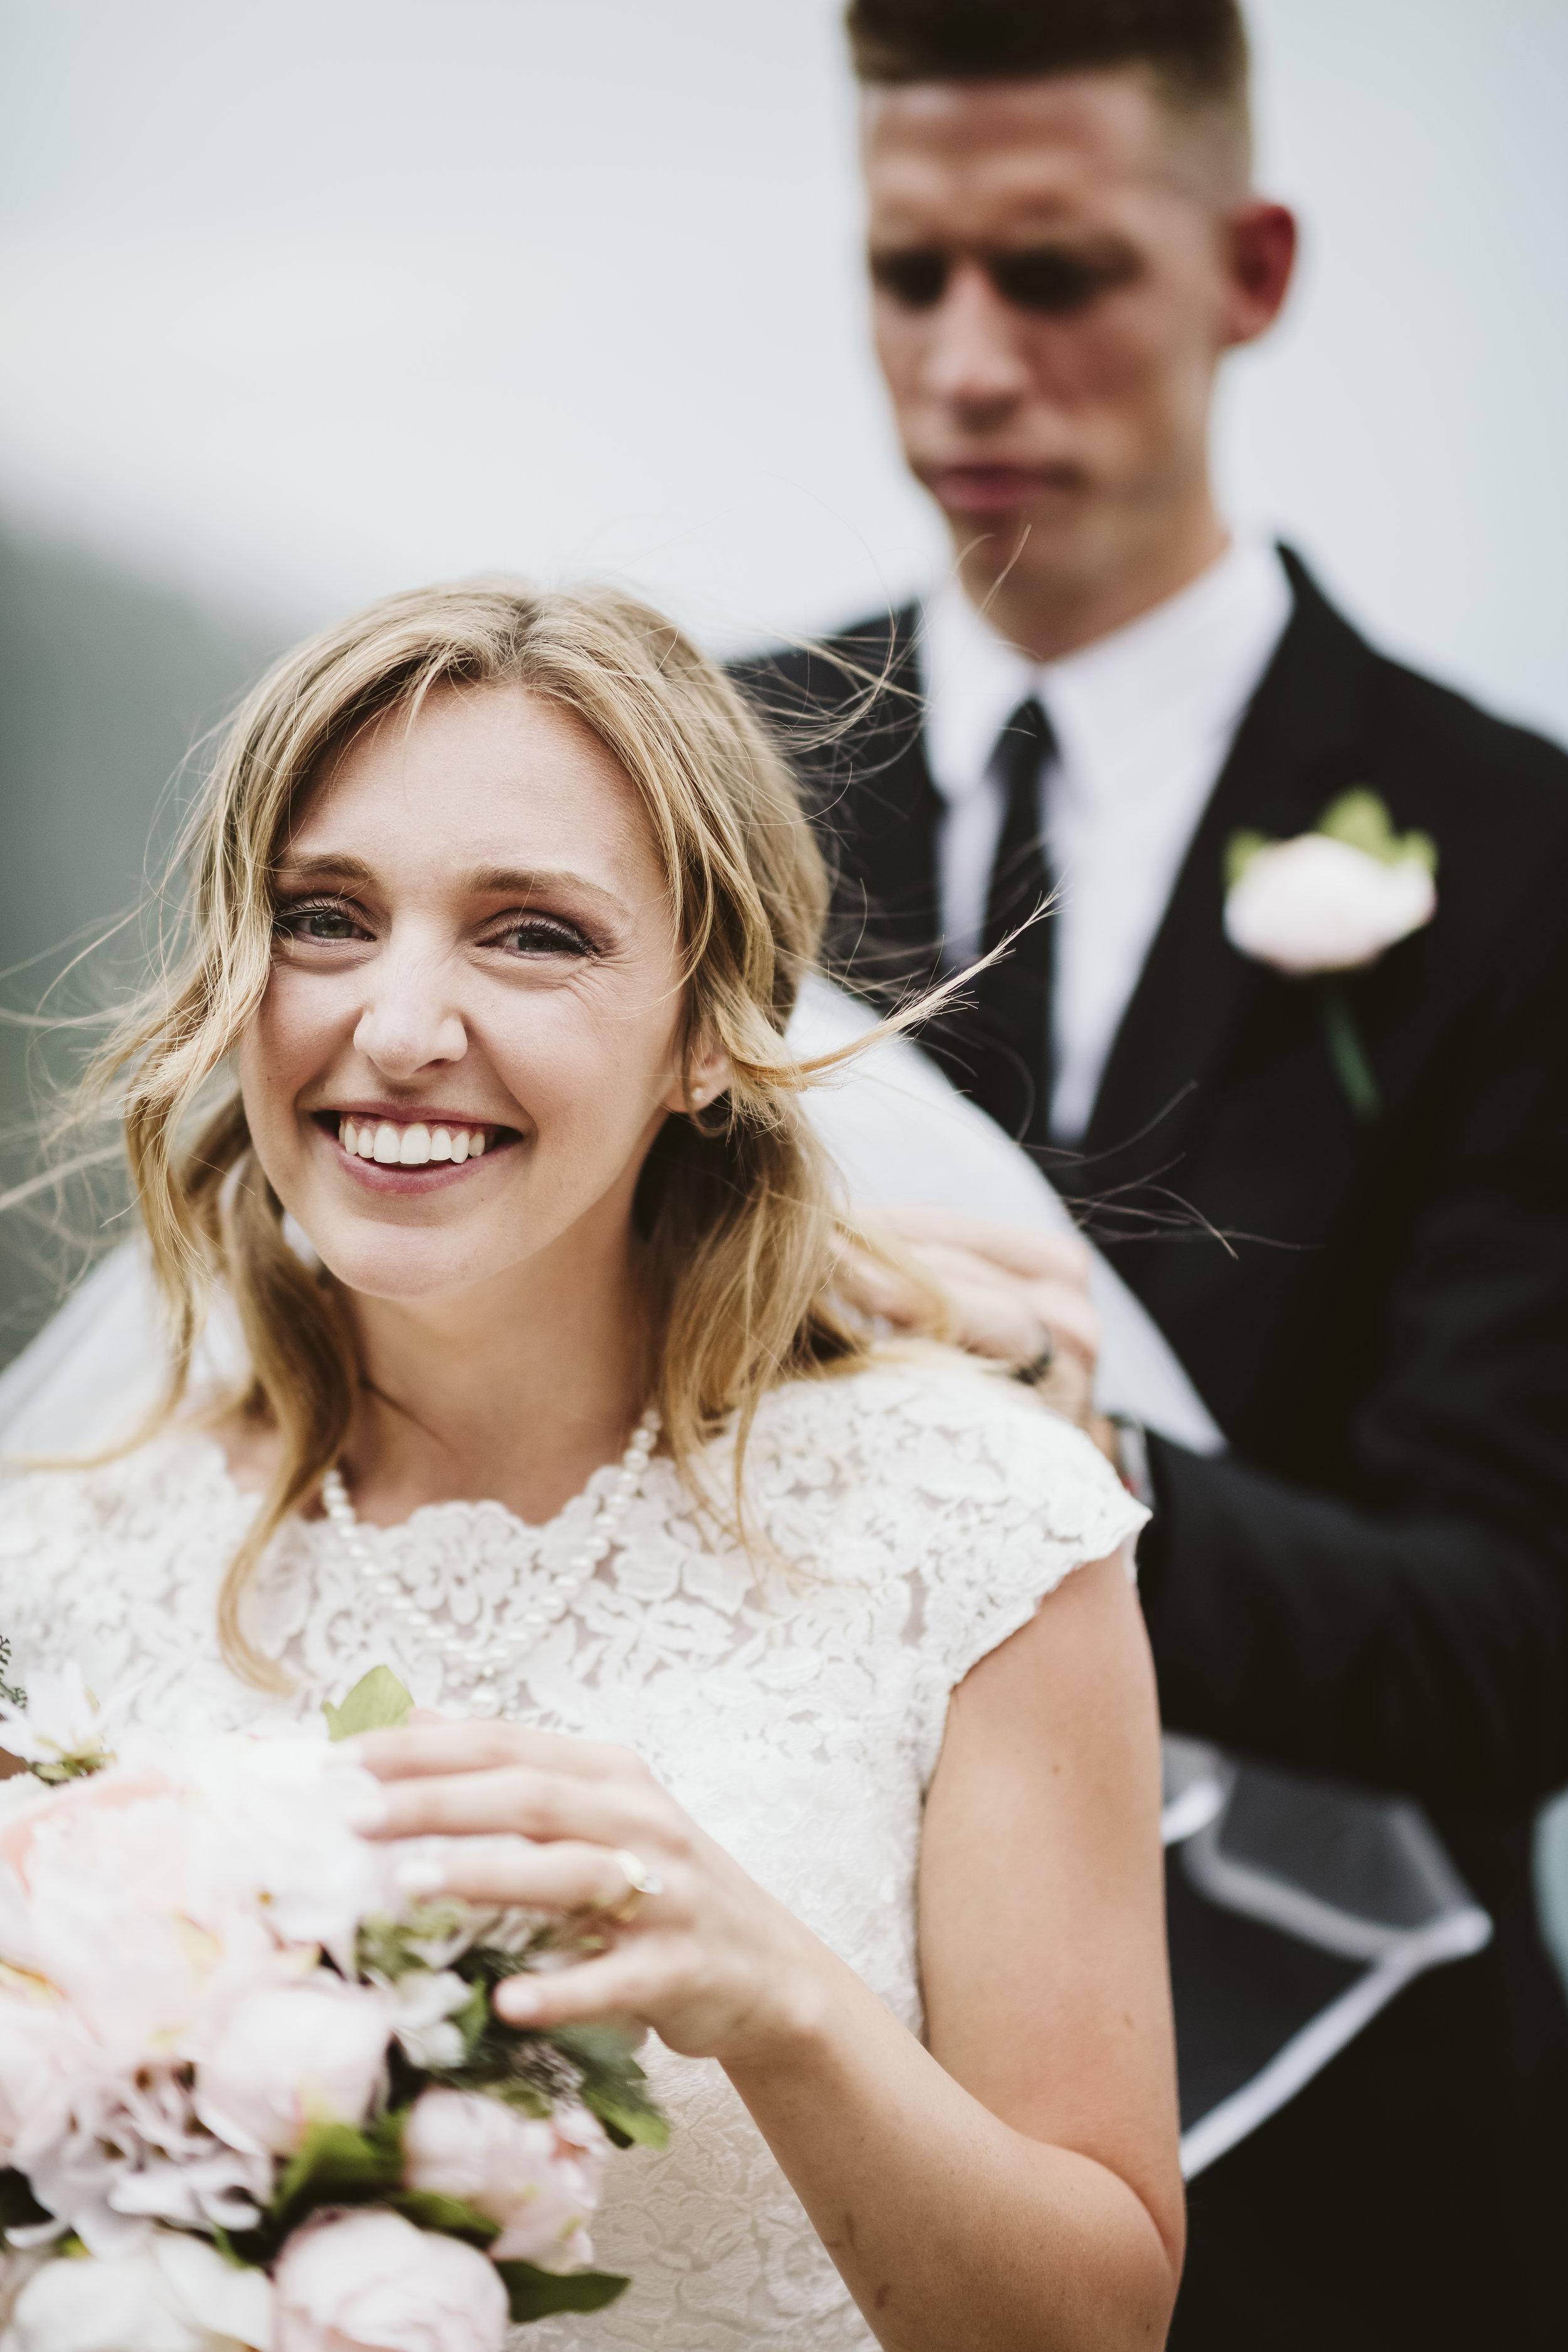 _P8A0408-Editvildphotography-adventurewedding-adventurouswedding-tahoewedding-laketahoewedding-adventureelopement-laketahoeweddingphotographer-wedding-photographer-weddingphotographer-Chase-Sam.jpg